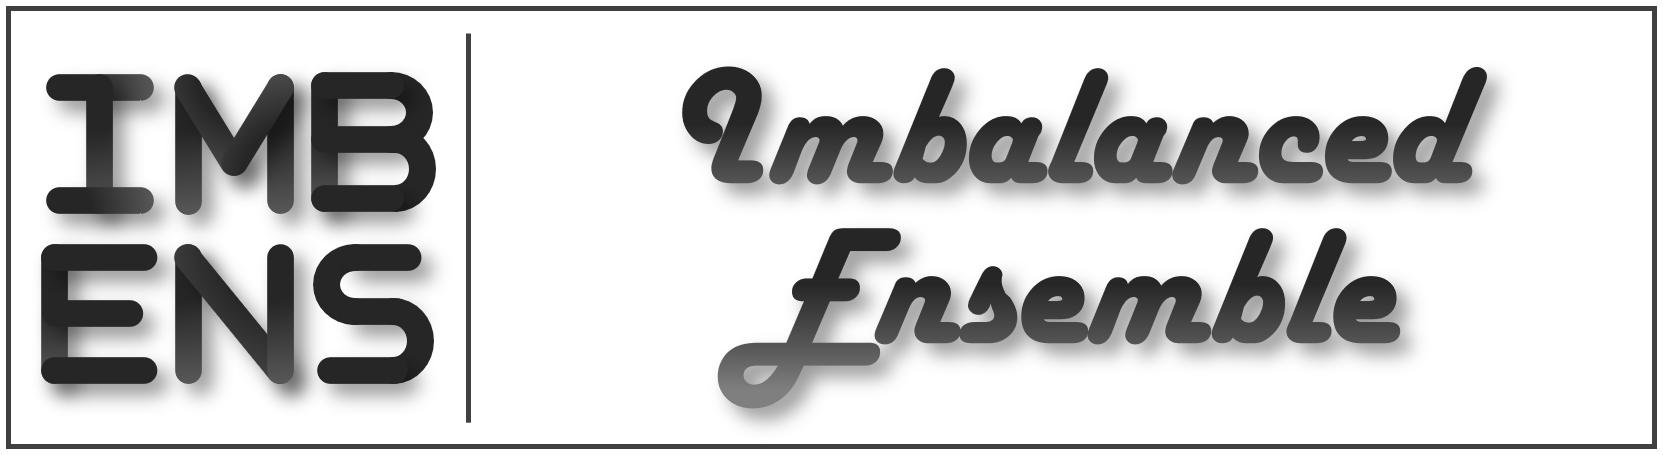 https://raw.githubusercontent.com/ZhiningLiu1998/figures/master/imbalanced-ensemble/imbalanced_ensemble_header.png